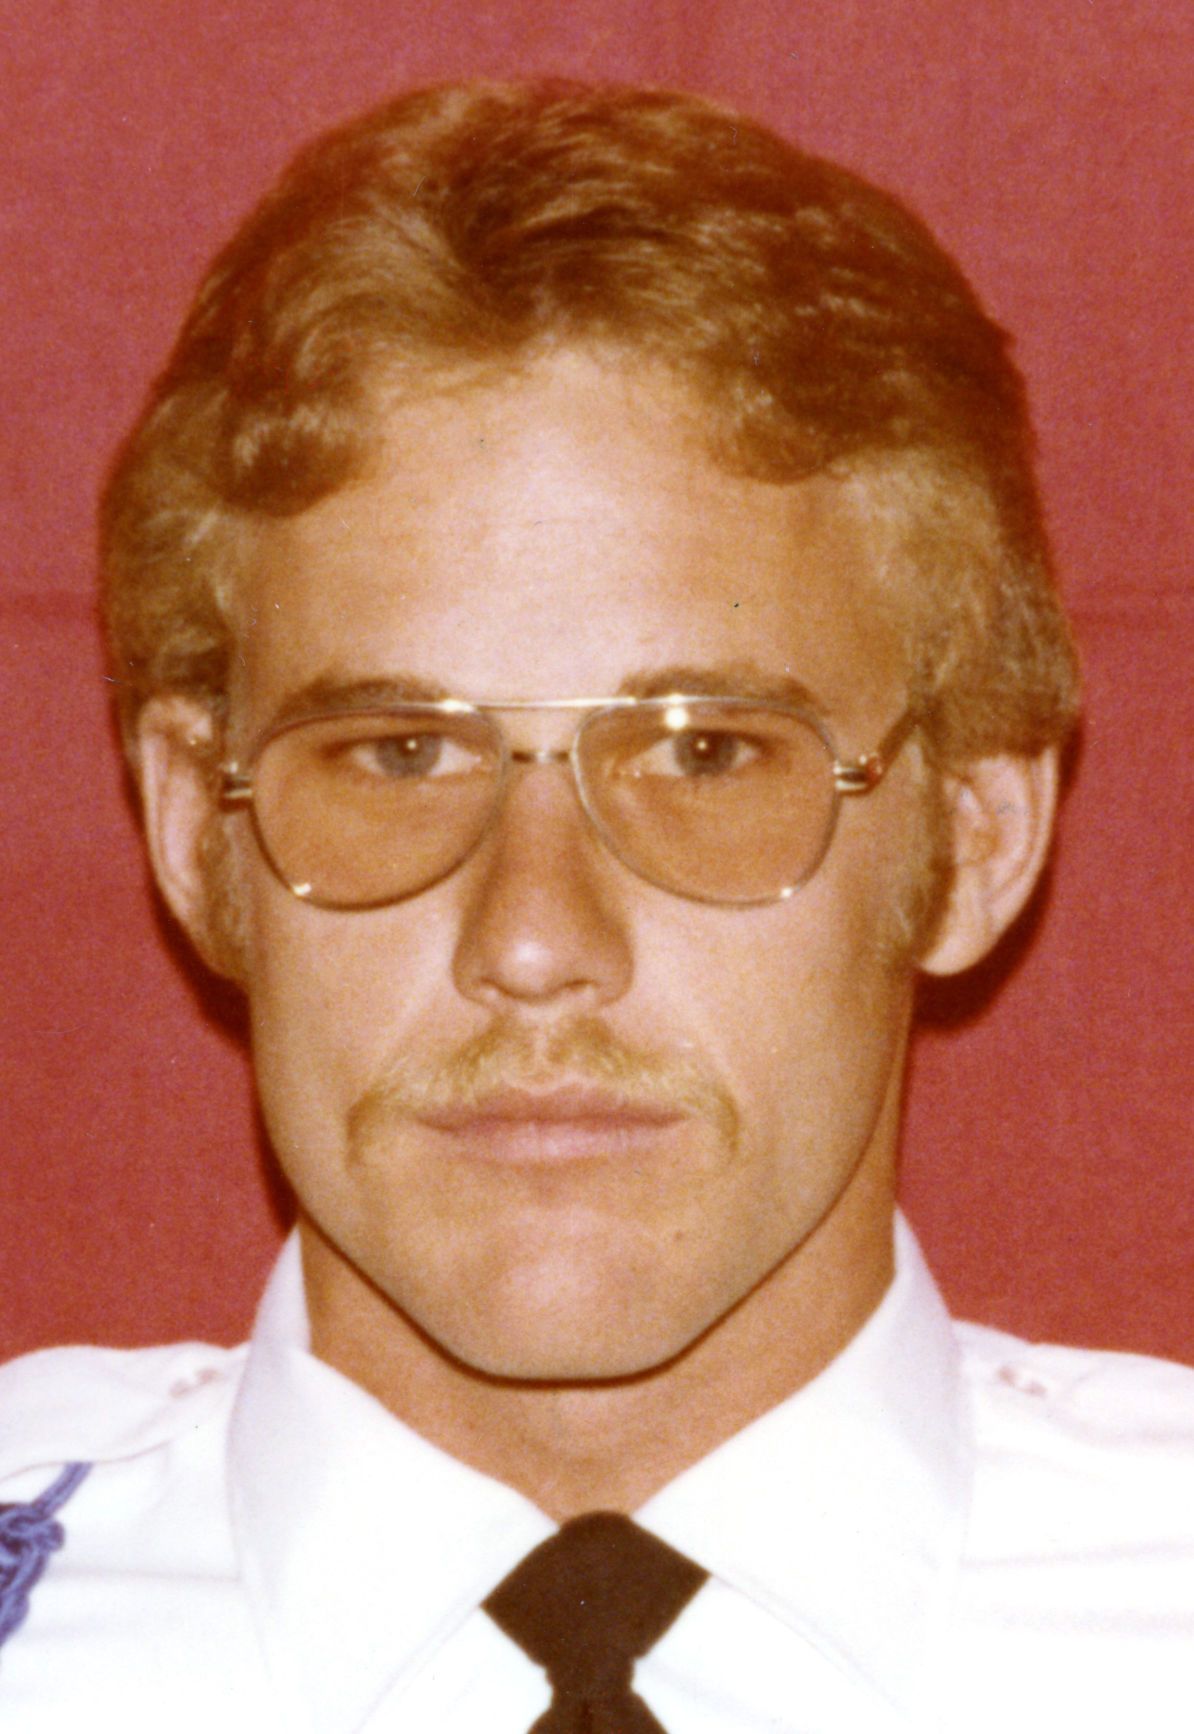 Tucson Police Officer Jeffrey H. Ross